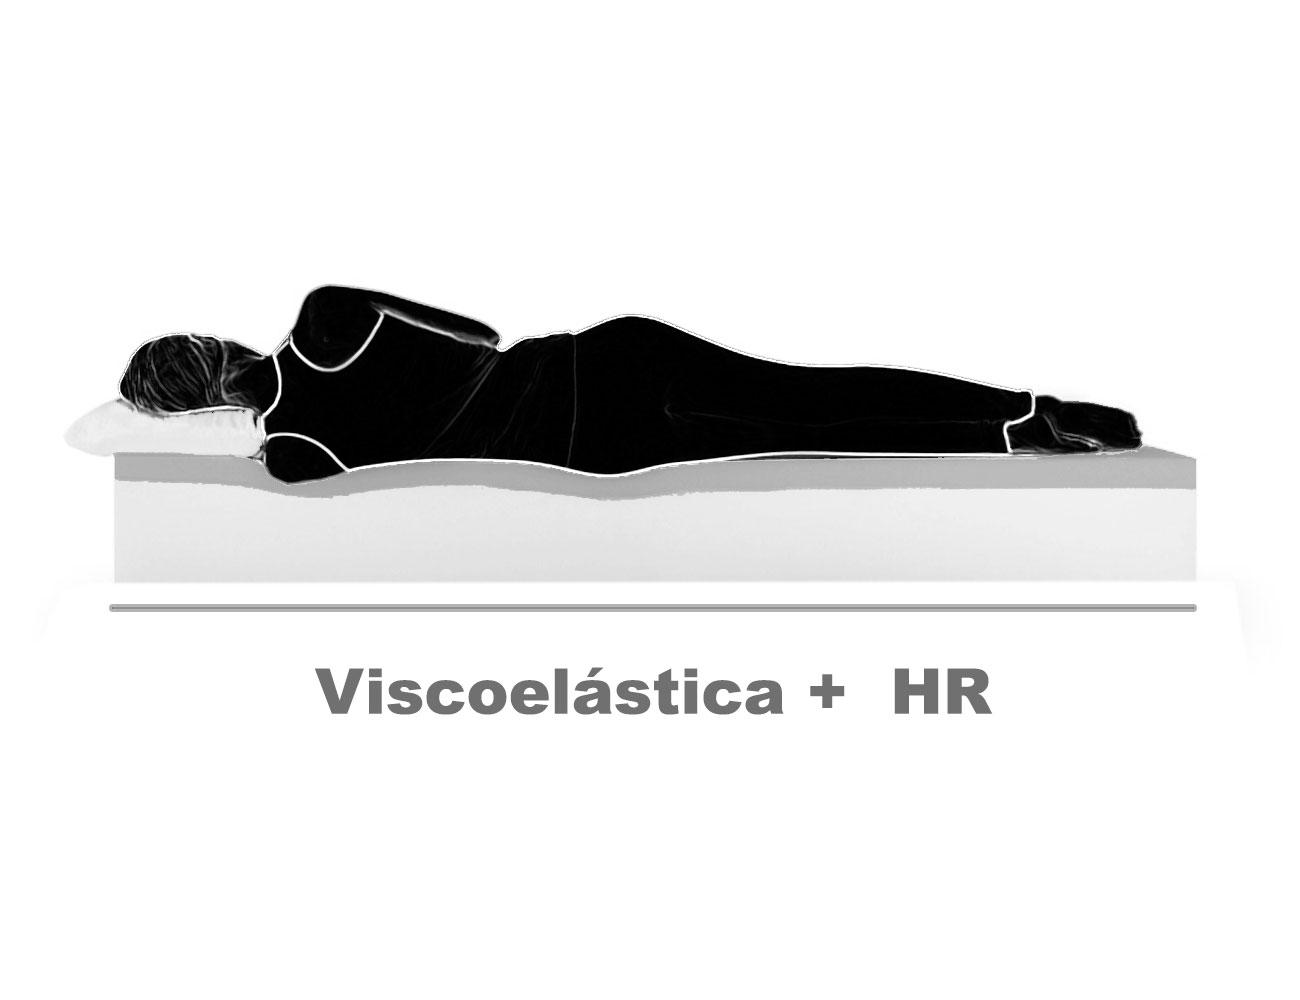 Viscoelstica hr5